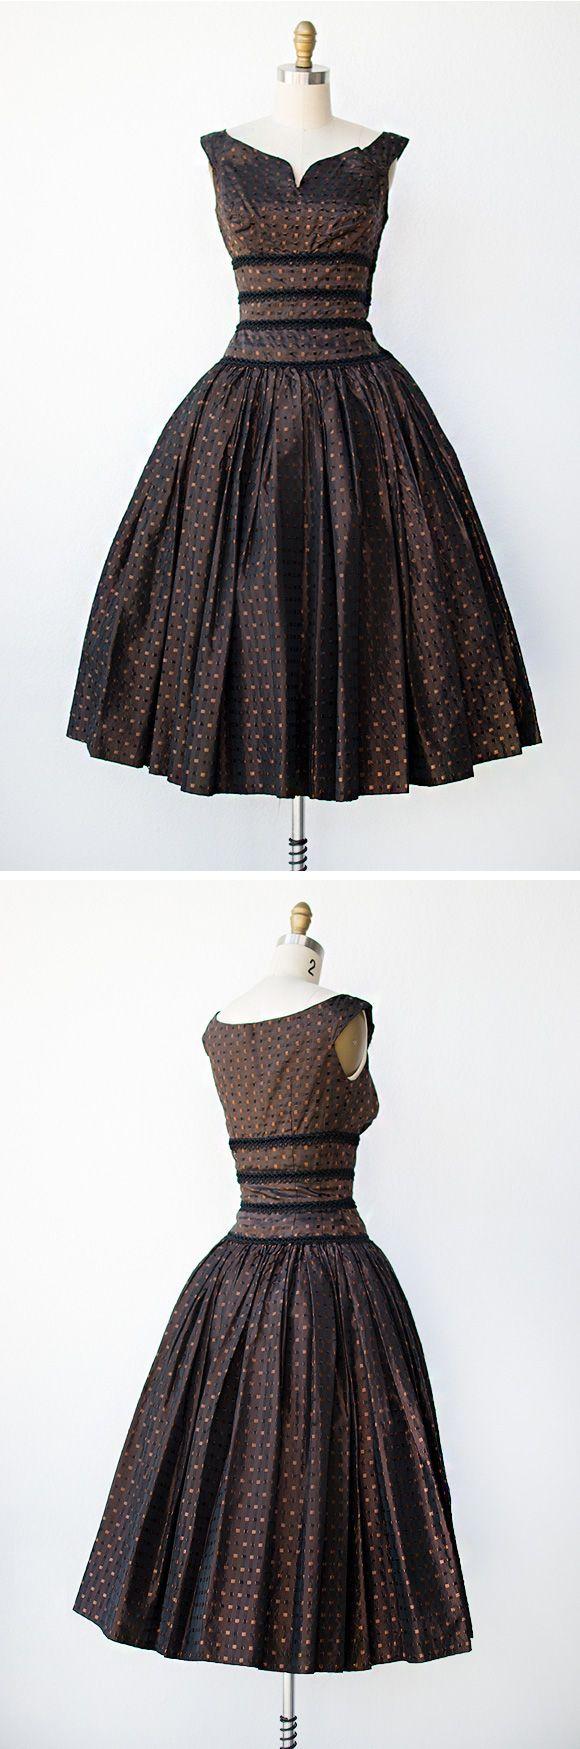 vintage 1950s dress | Chocolaterie Dress